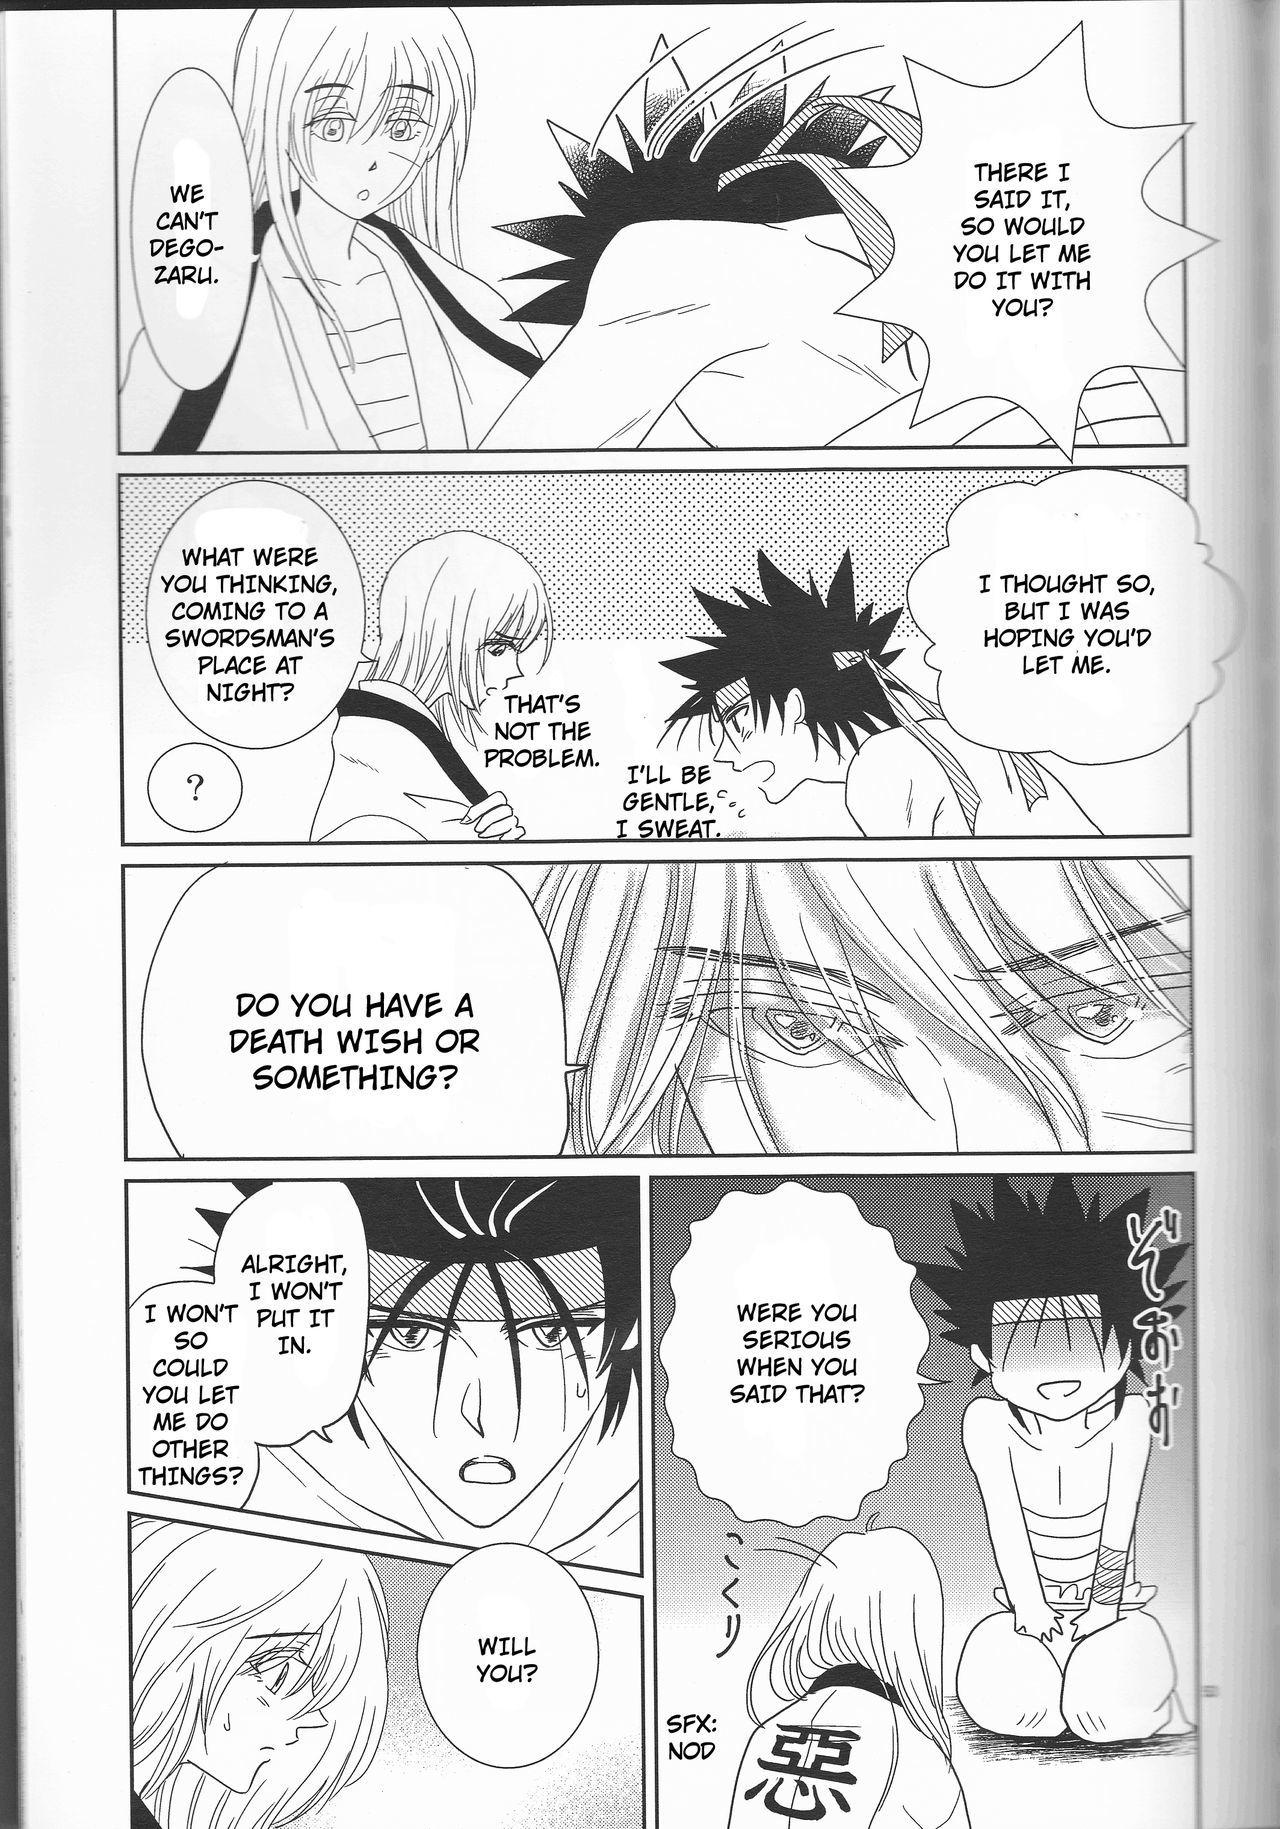 Hime ken ryoran page 53